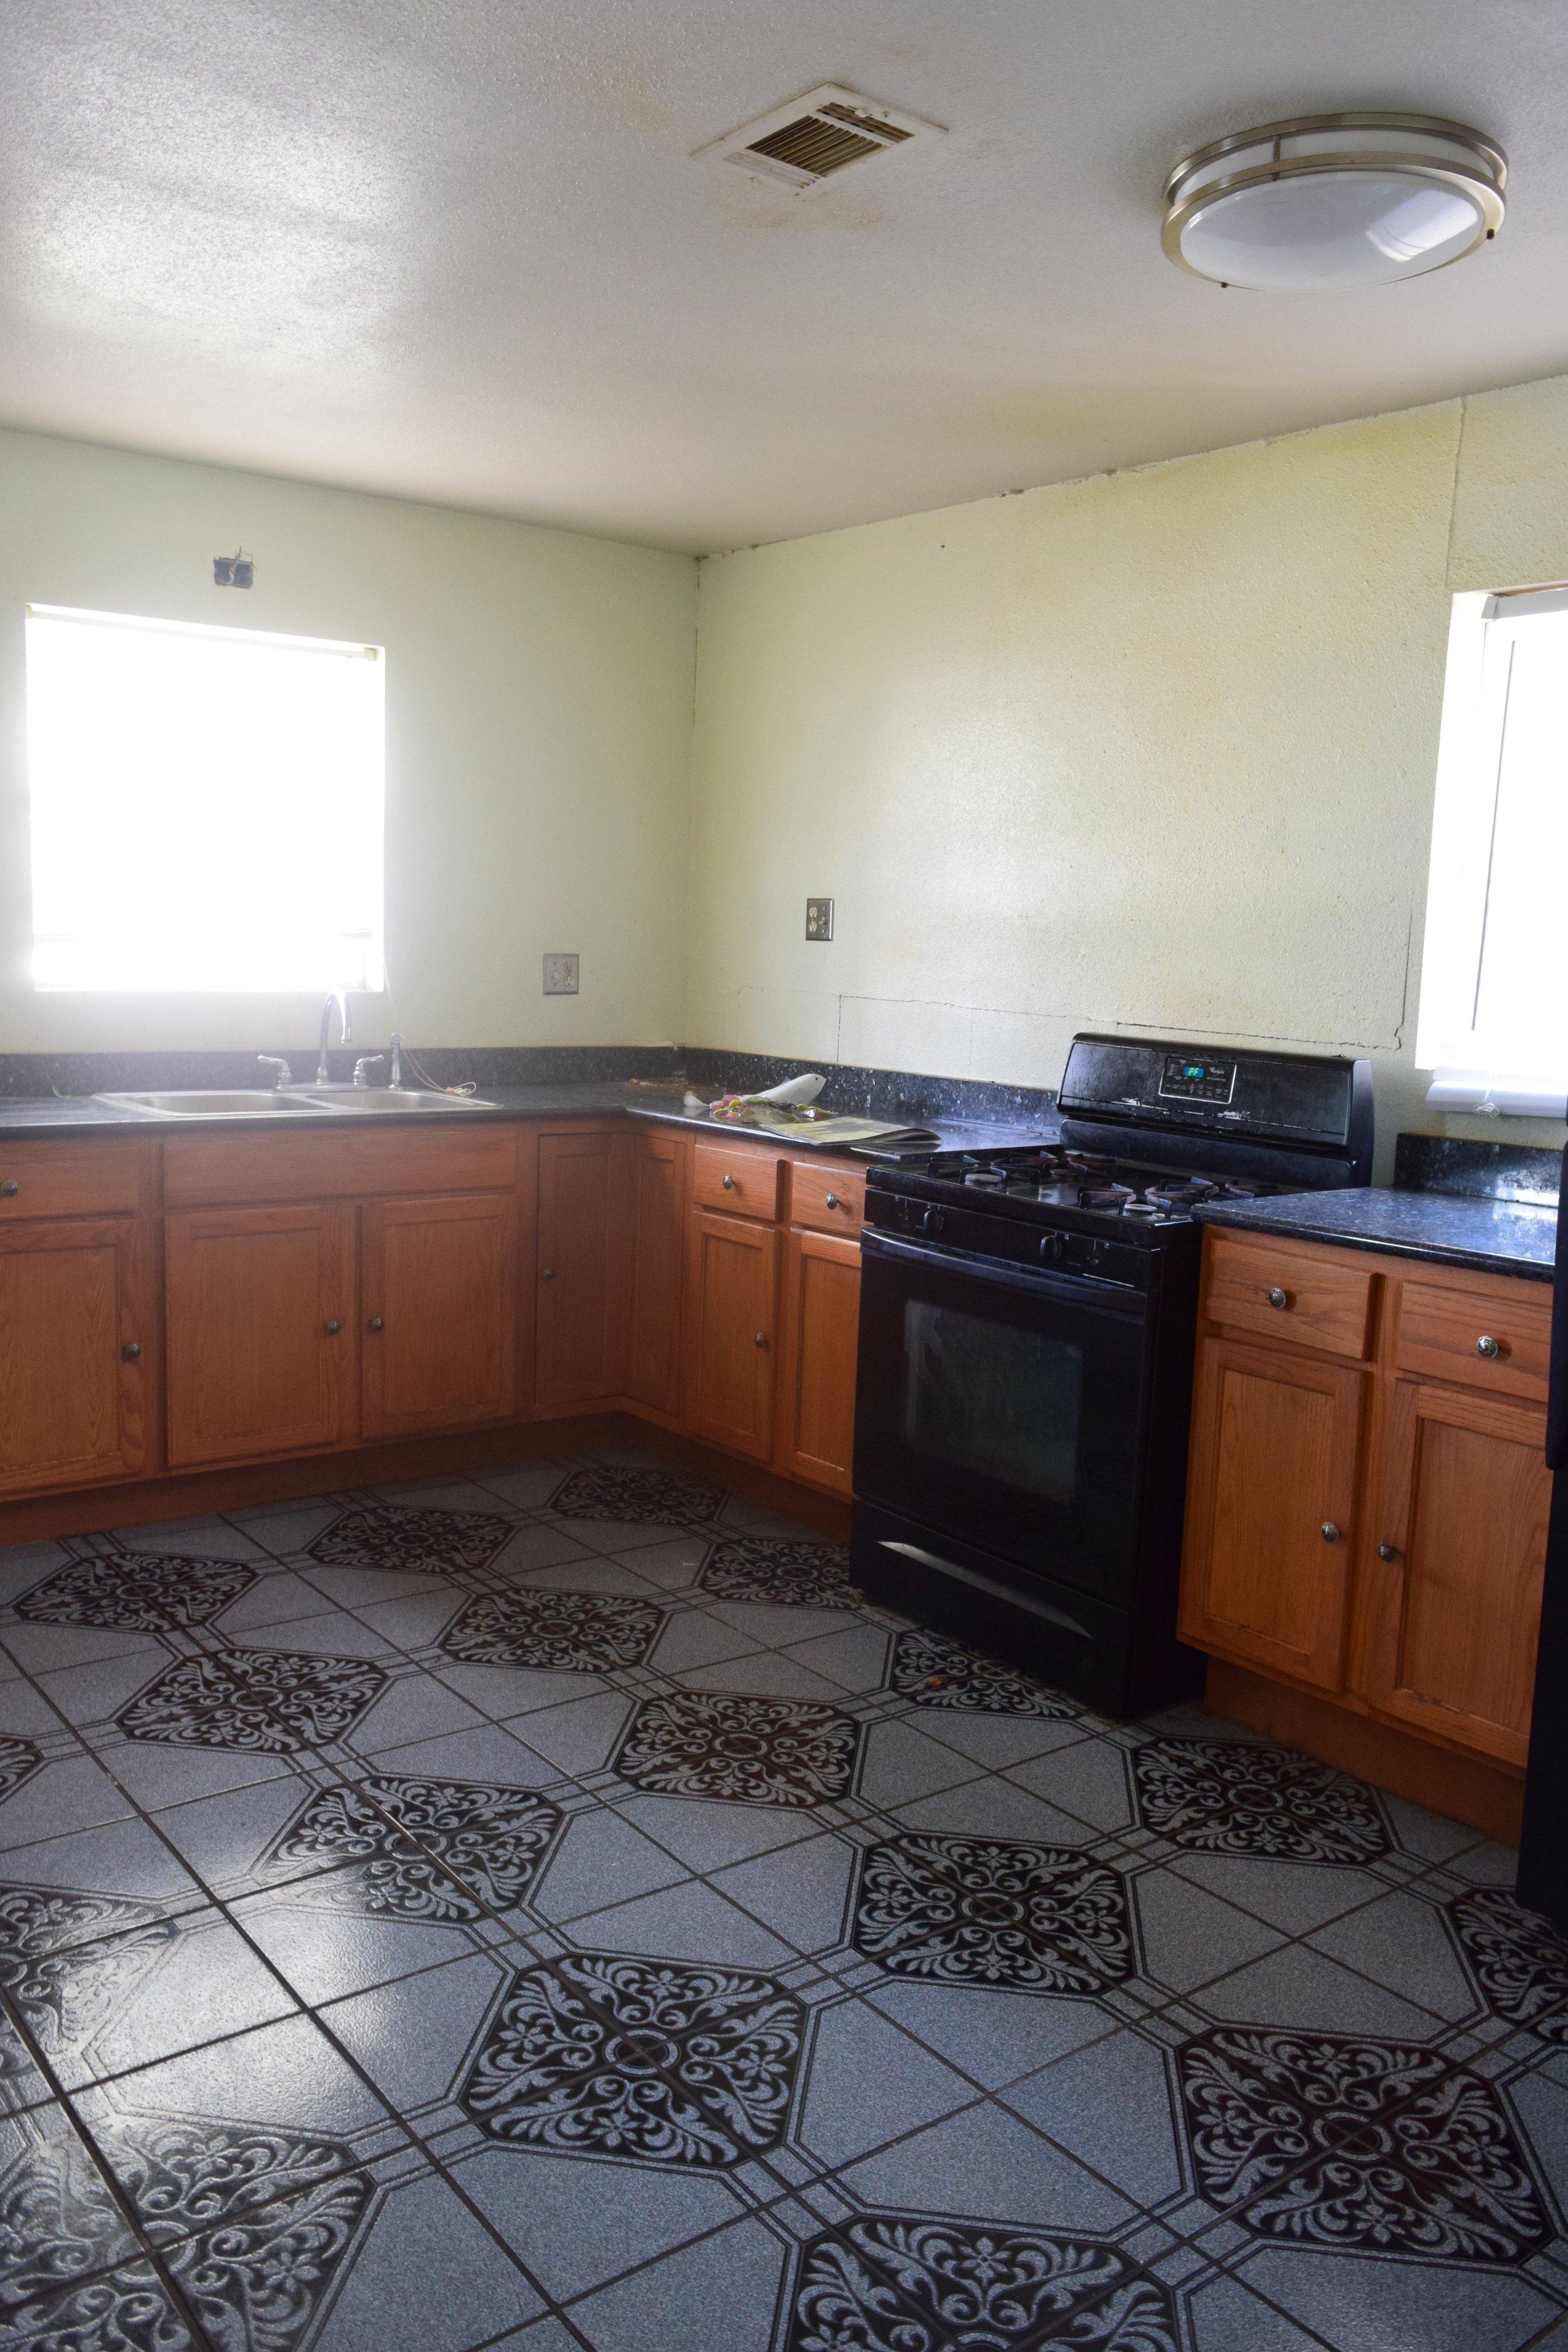 tiny-rehab-kitchen-before-2.jpg